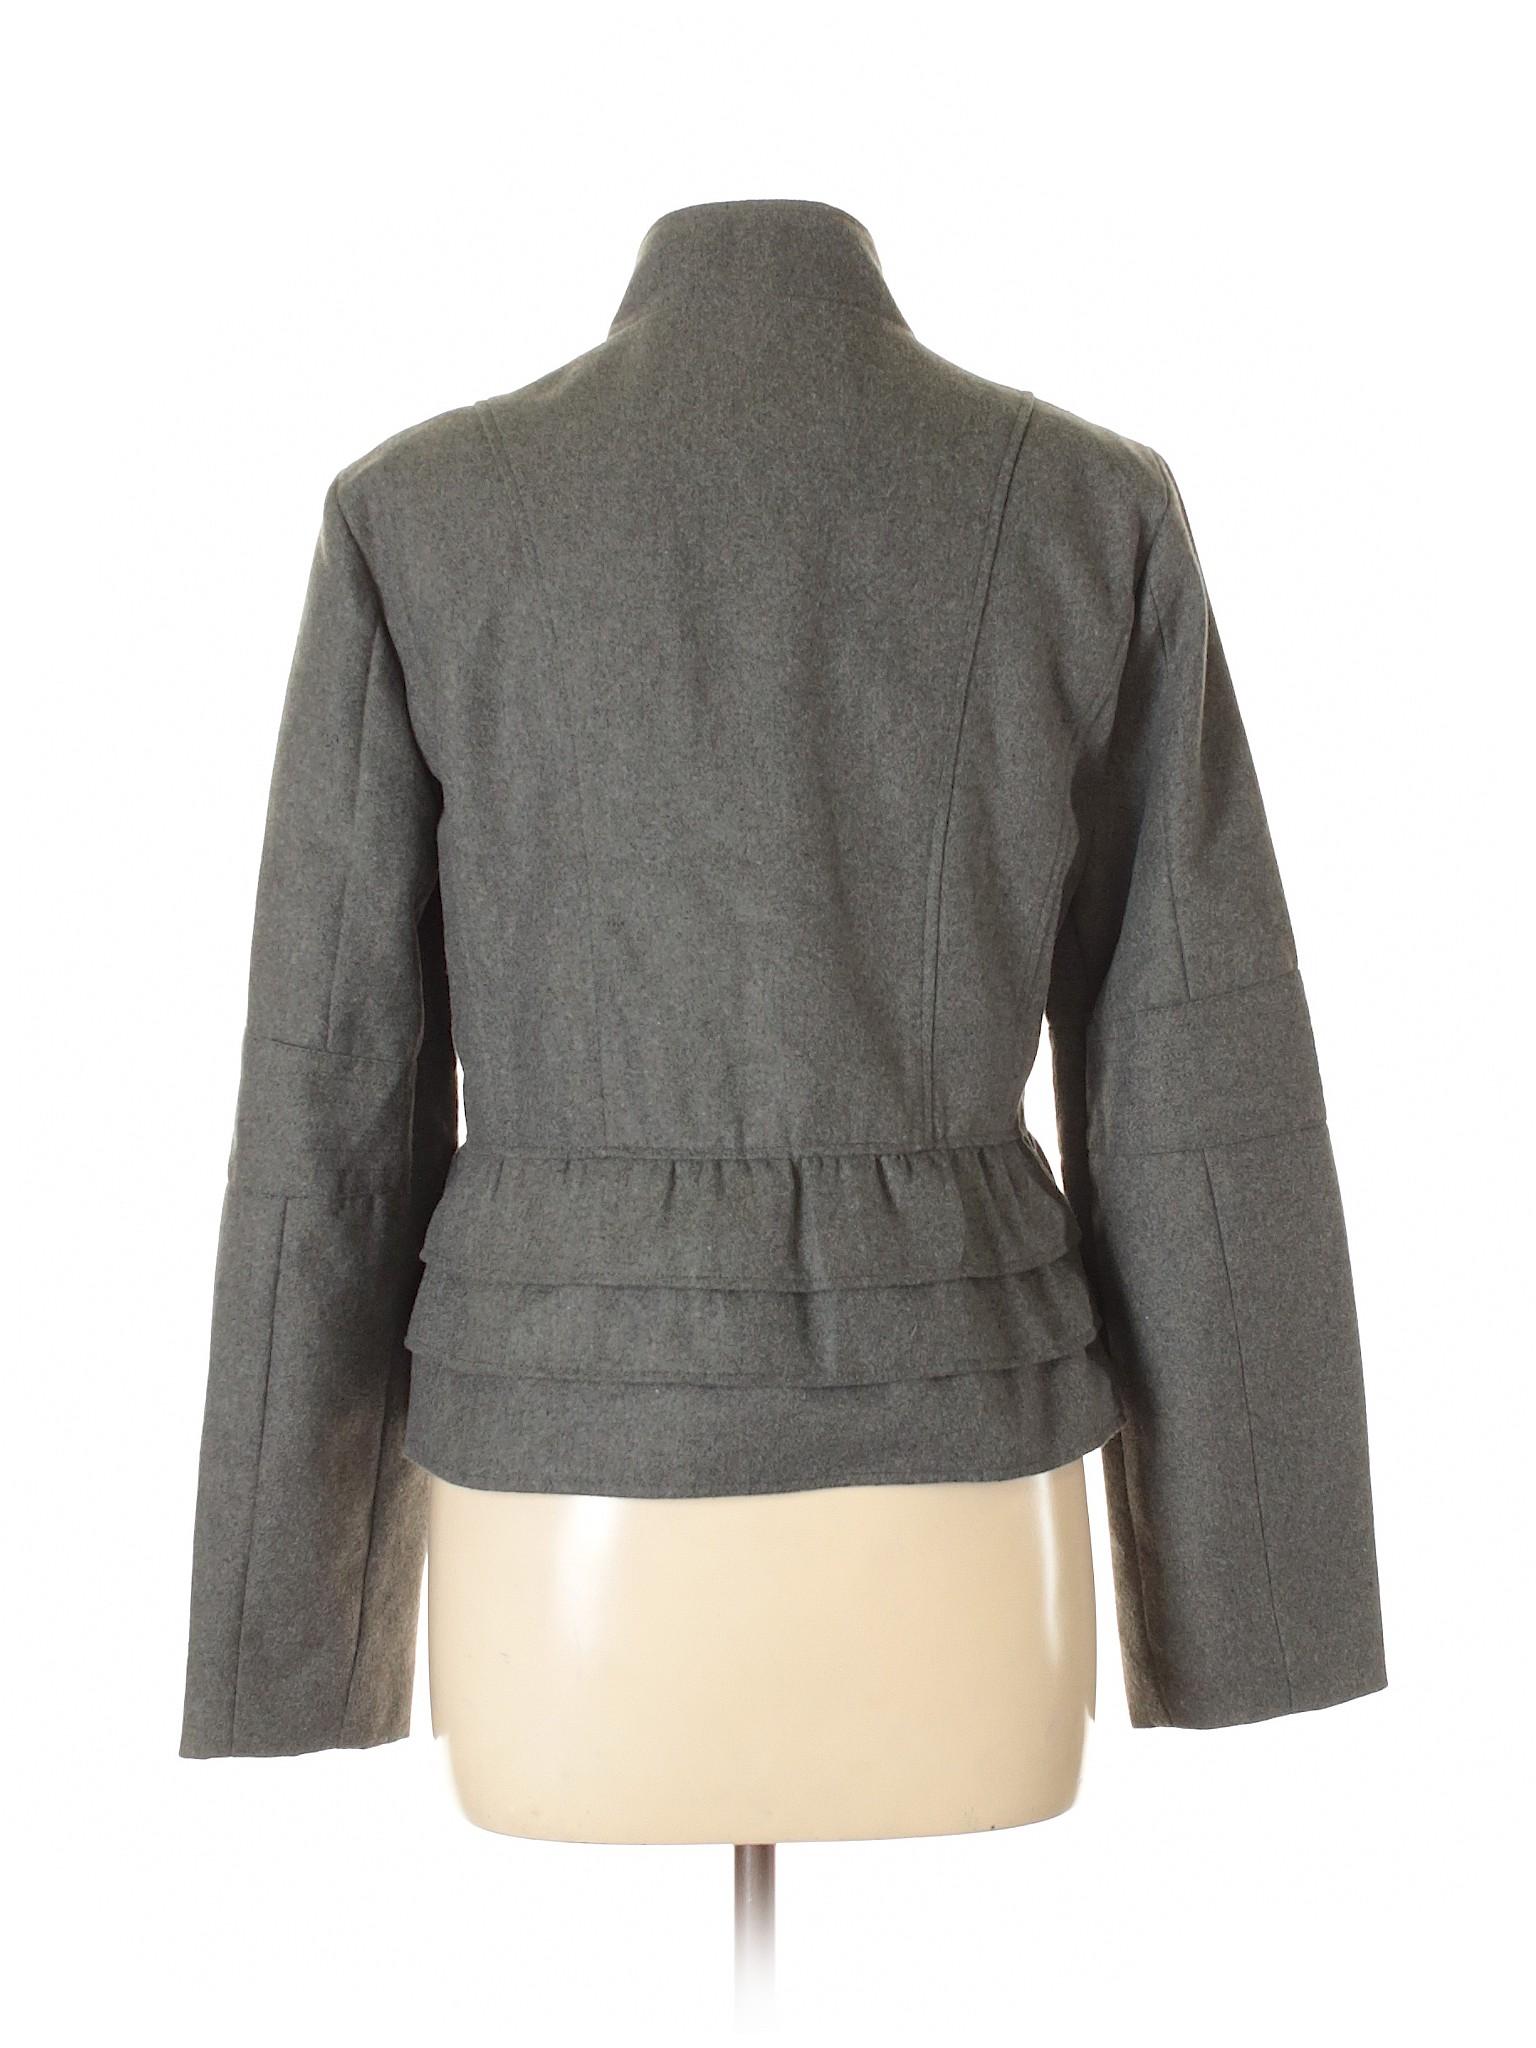 Coat Yoki winter Yoki winter Coat Boutique Boutique gYx06qE